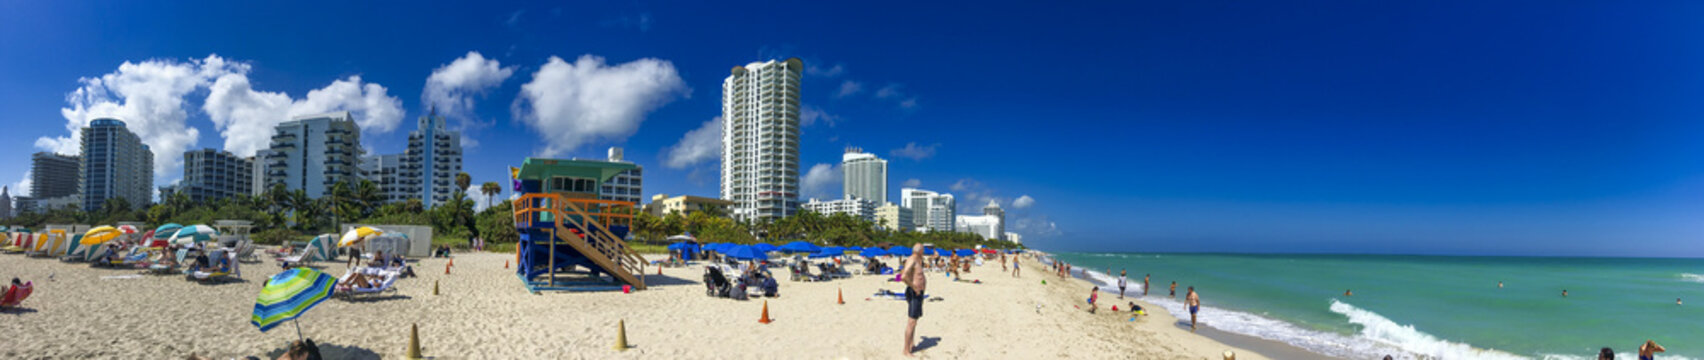 MIAMI BEACH, FL - FEBRUARY 2016: Tourists and locals enjoy the beautiful city beach